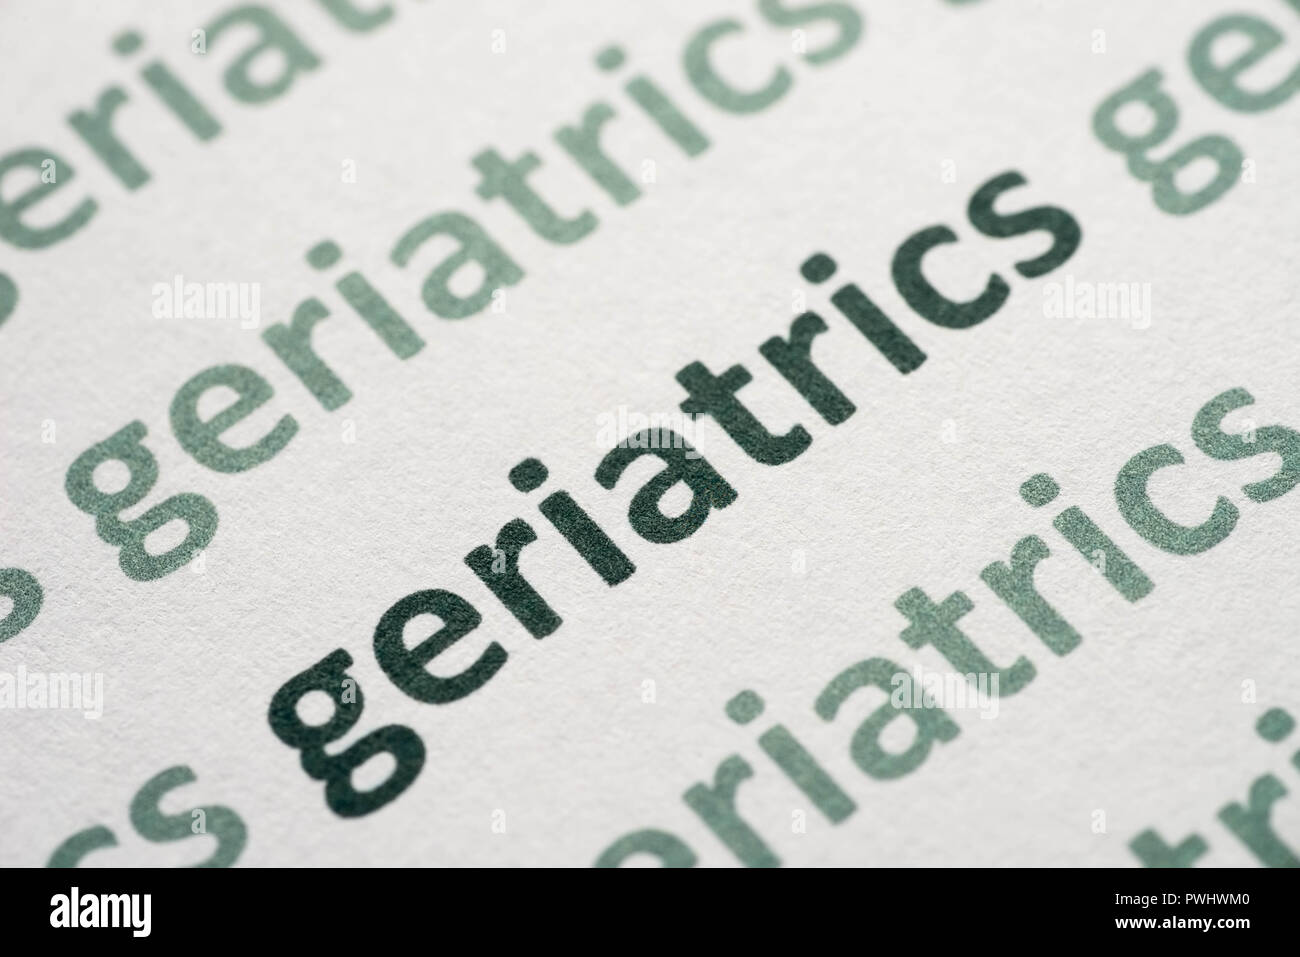 word geriatrics printed on whte paper macro - Stock Image